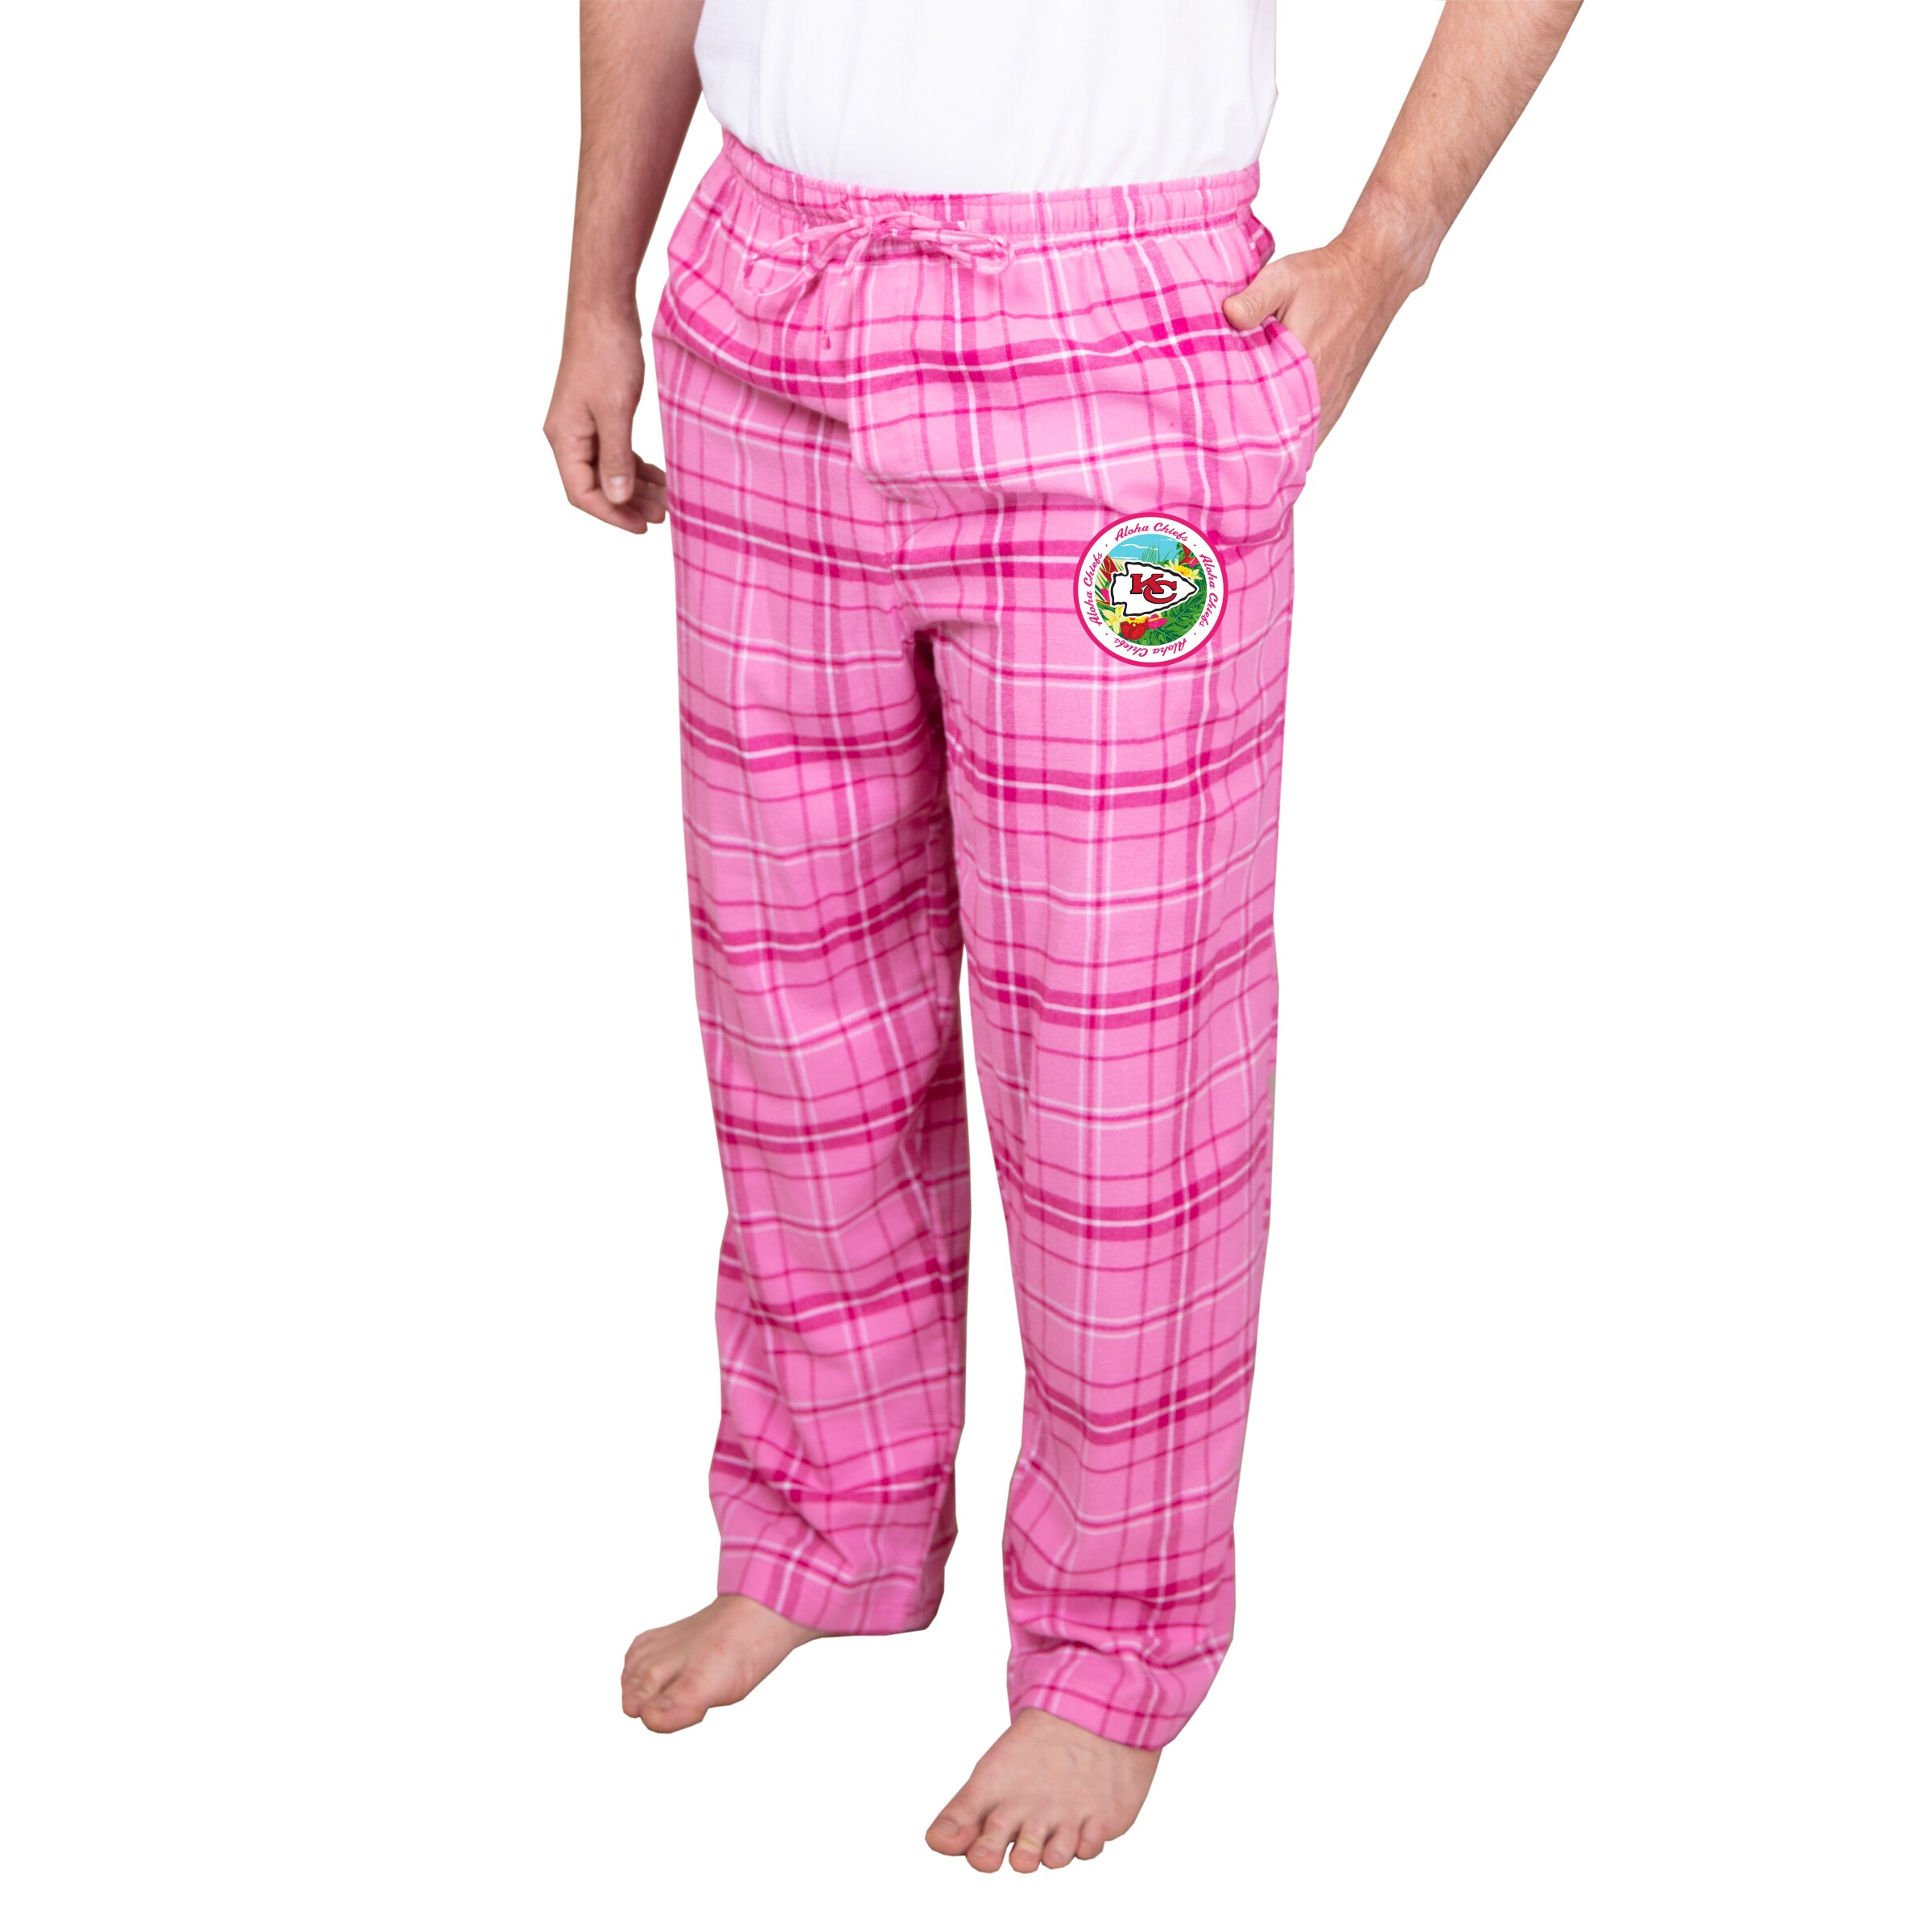 Kansas City Chiefs Concepts Sport Ultimate Pants - Pink